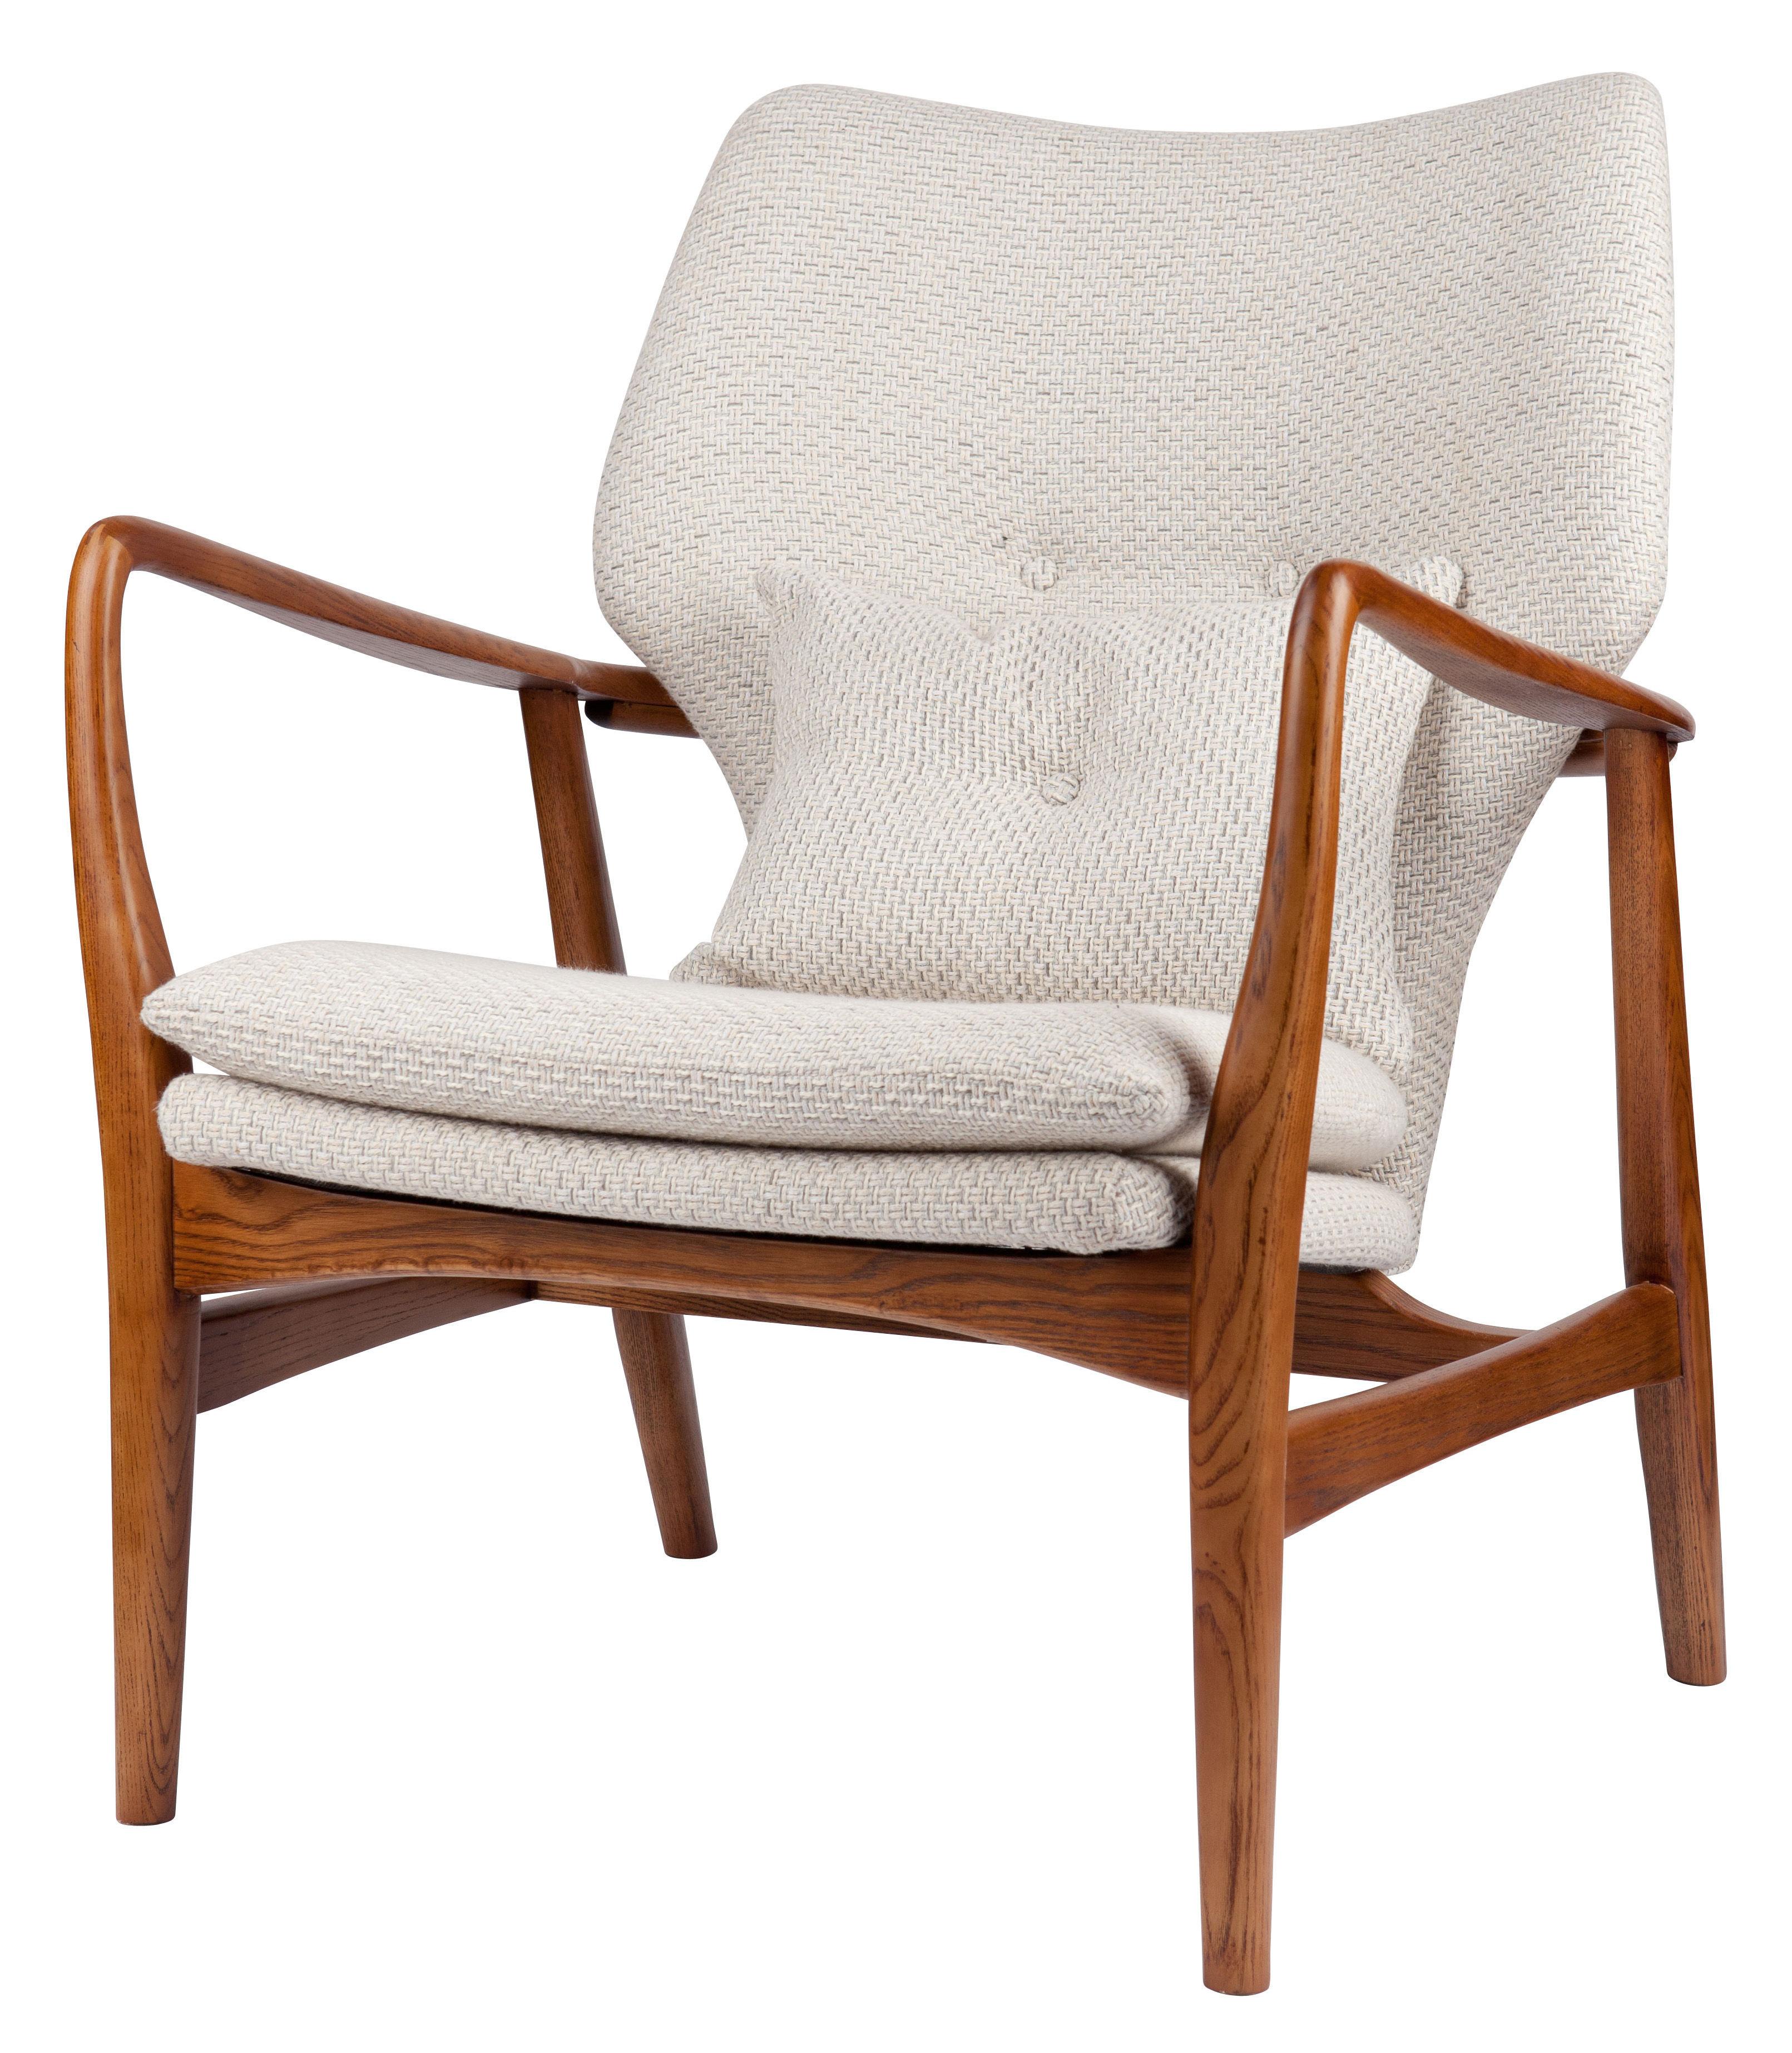 aktion - Moderne Natur - Peggy Gepolsterter Sessel / Stoff & Holz - Pols Potten - Naturfarben / holzfarben - Gewebe, lackierte Esche, Schaumstoff